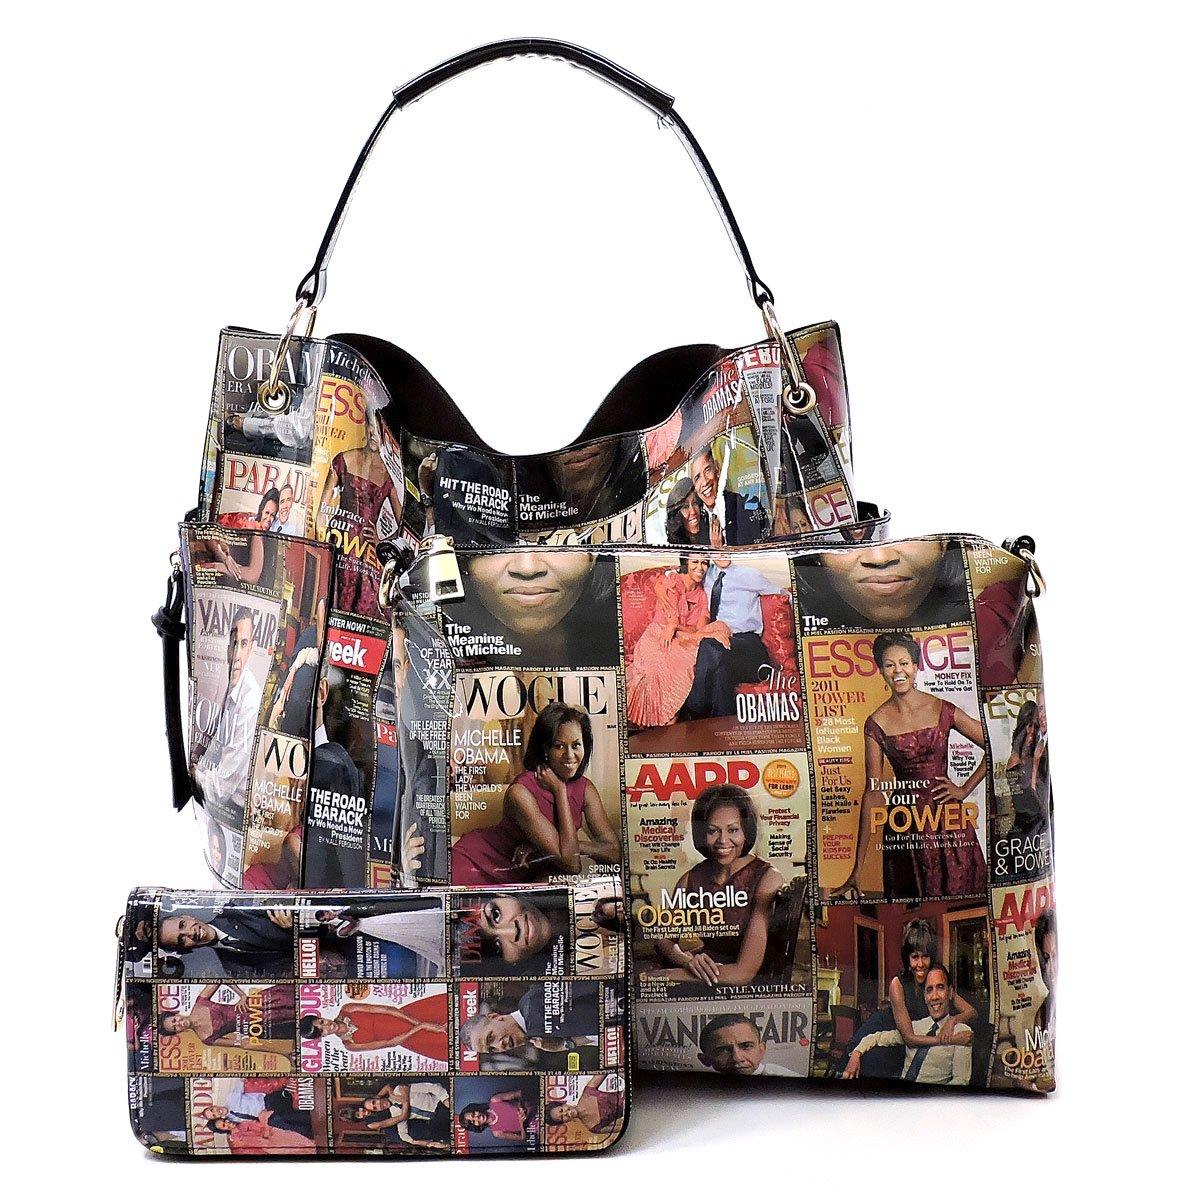 Glossy Magazine Cover Collage 3-in-1 Shoulder Bag Hobo Michelle Obama Handbag (Q-Multi) by Elphis